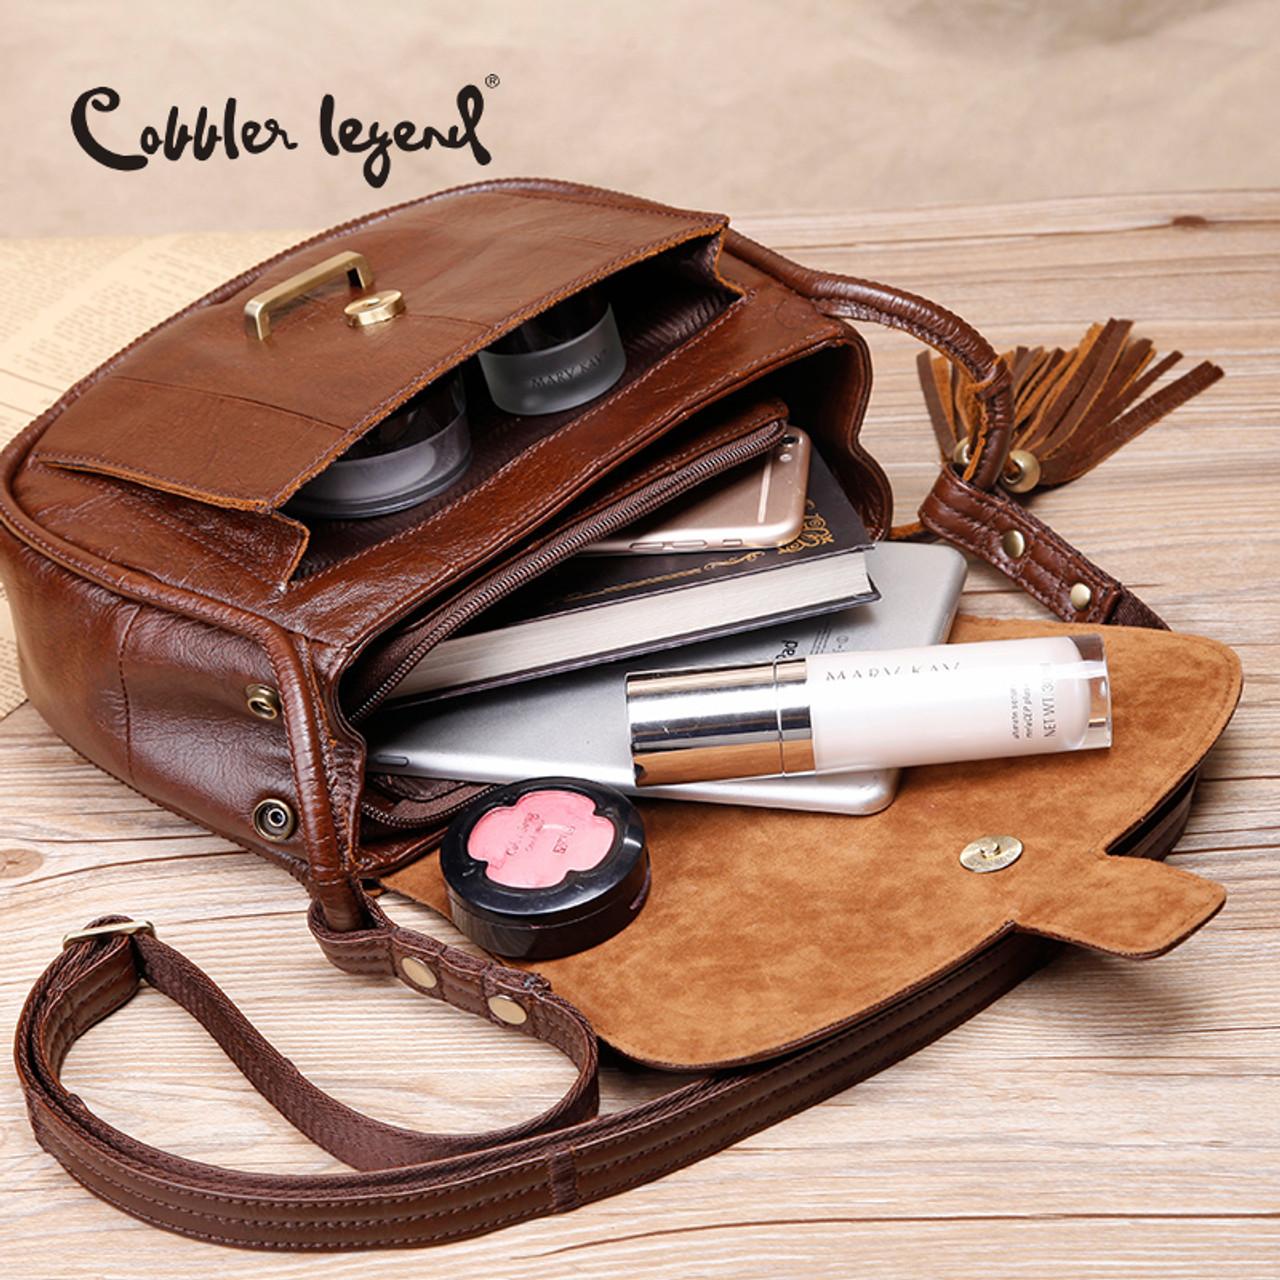 9ce636a5de18 ... Cobbler Legend Brand Designer 2017 Women s Genuine Leather Vintage  Single Shoulder Bag Women Crossbody Bags Handbags ...